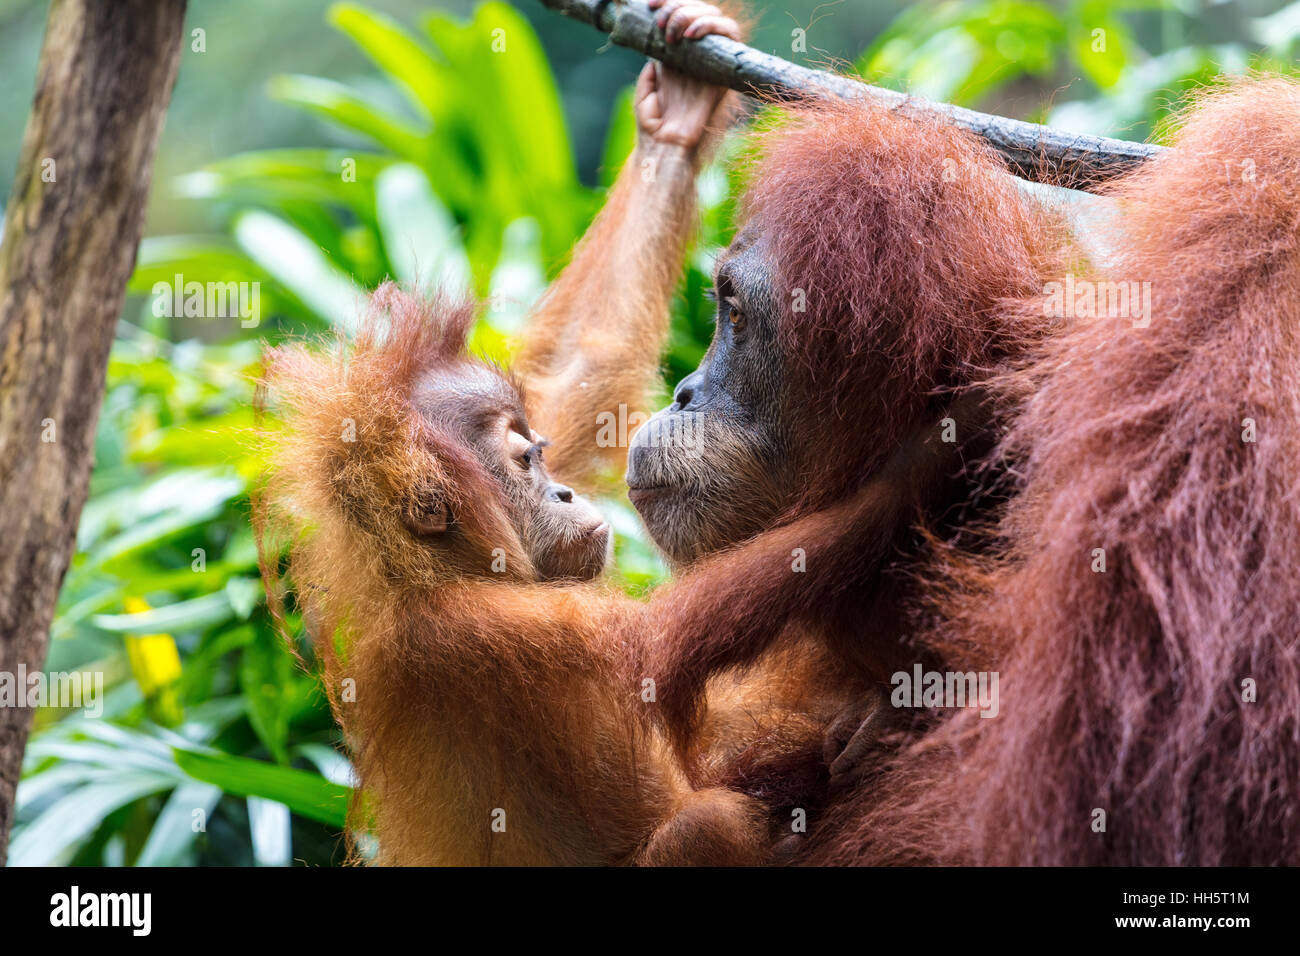 Mère avec bébé orang-outan Photo Stock